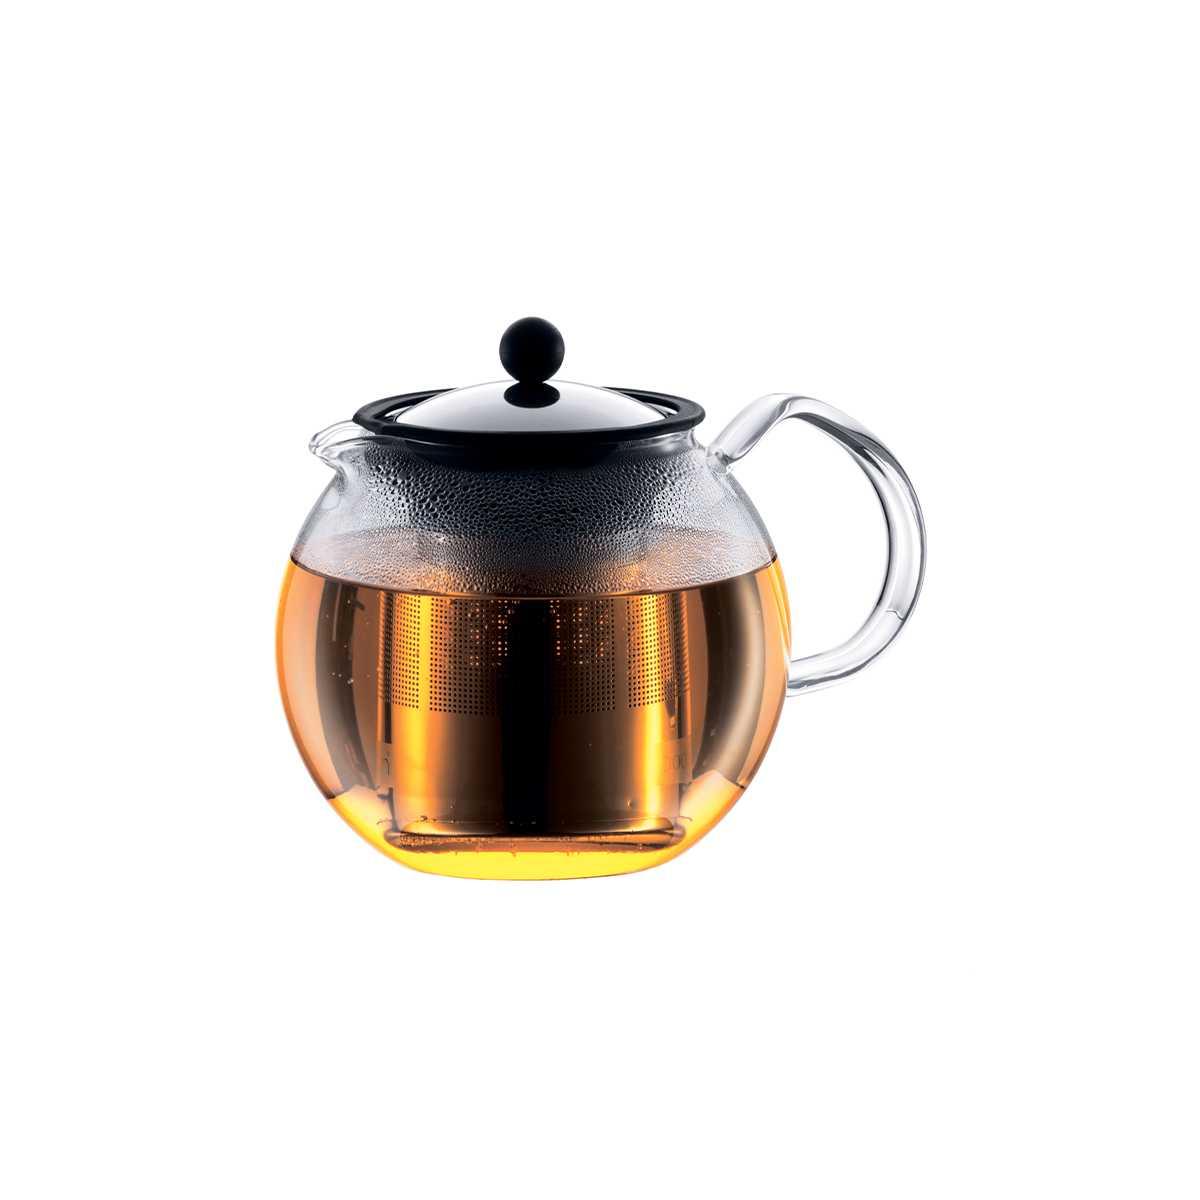 Онлайн каталог PROMENU: Чайник 1,5 л Bodum Assam (1802-16) Bodum 1802-16